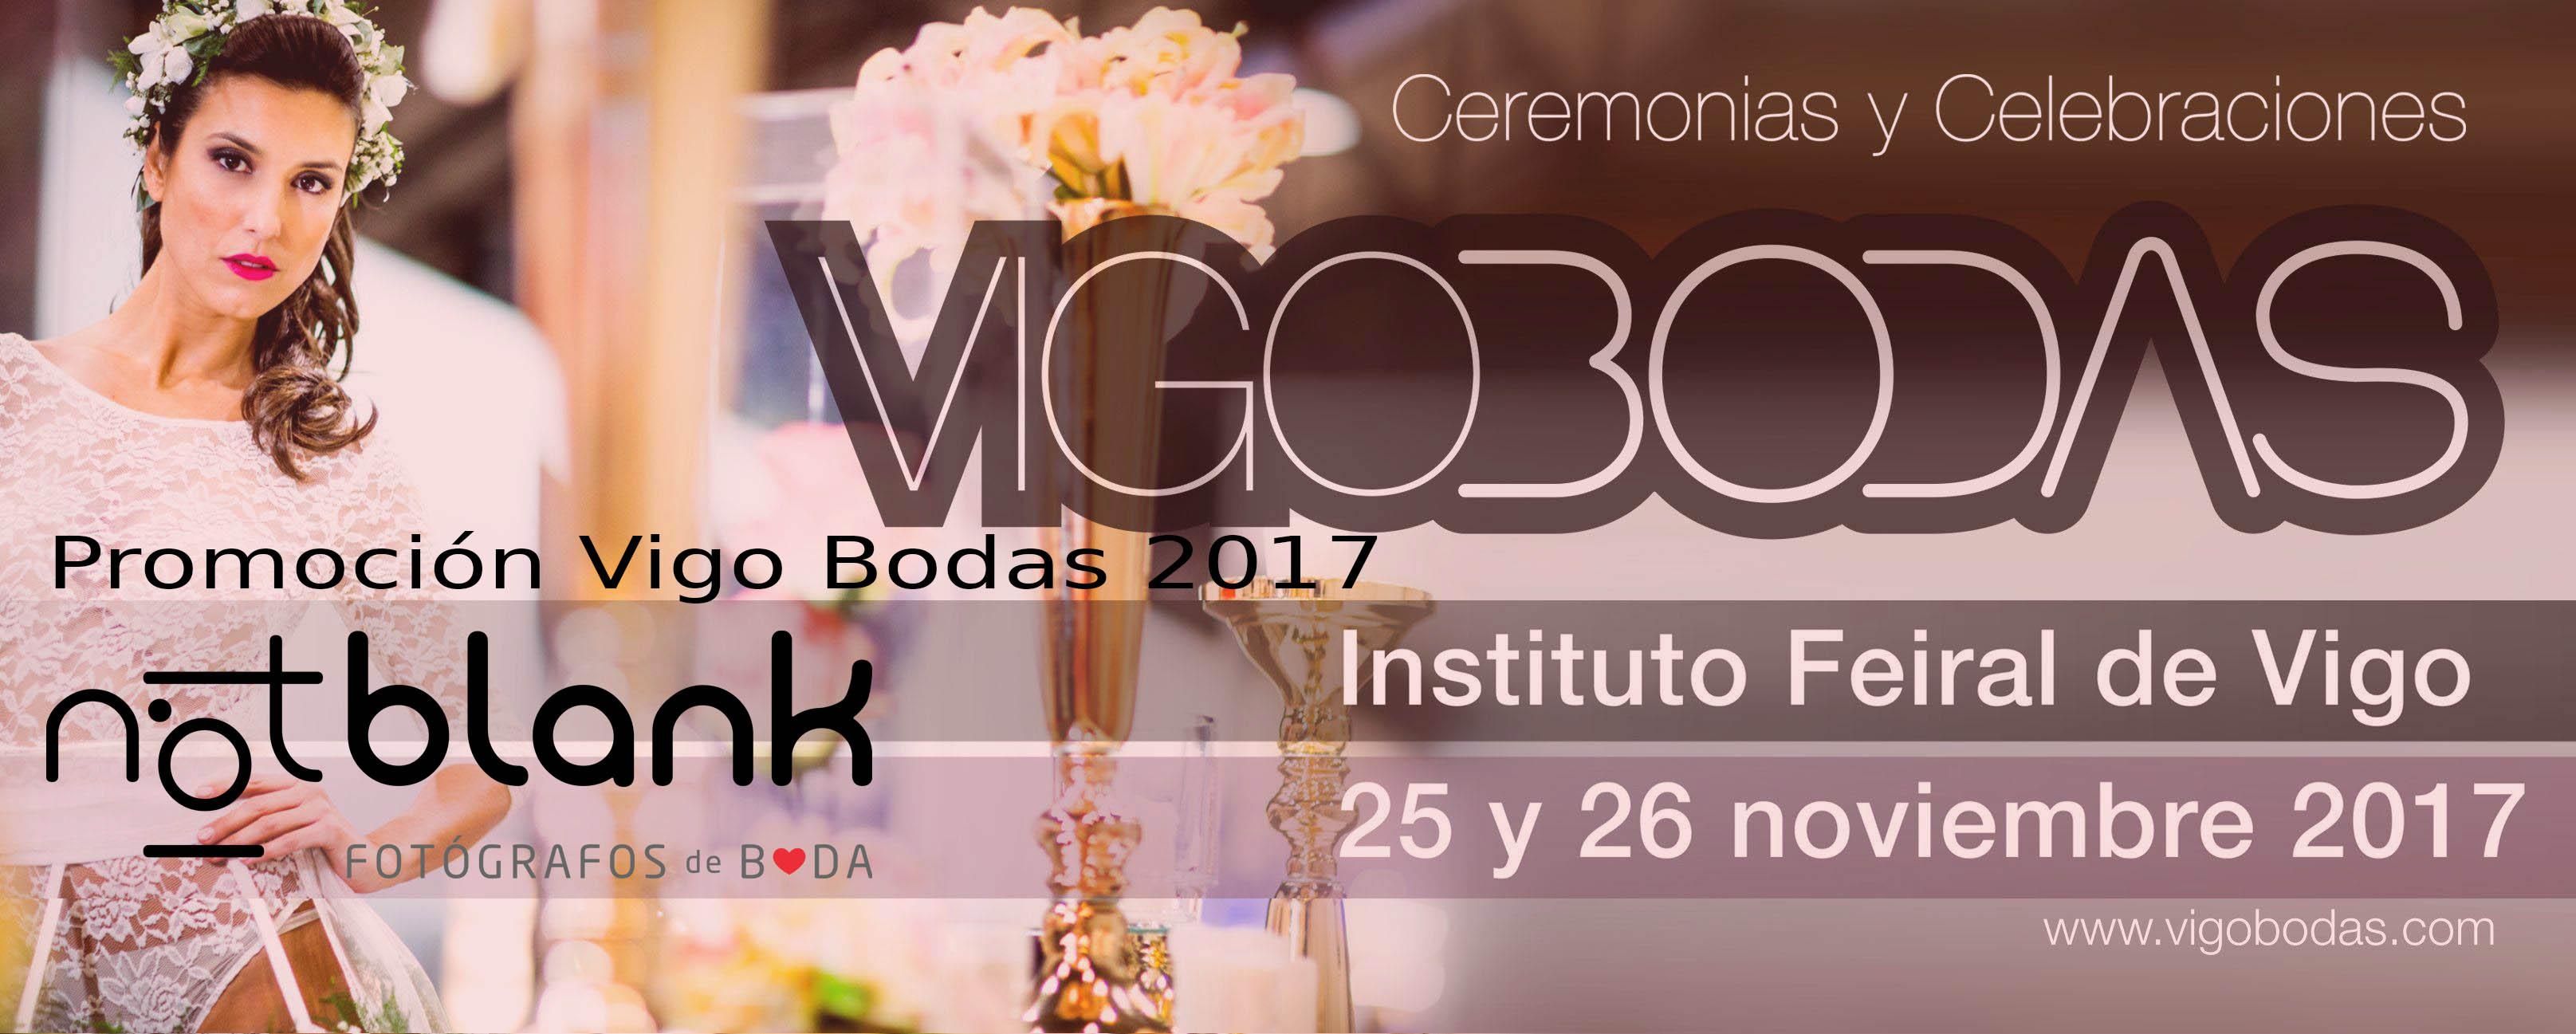 Promocion Vigo Bodas